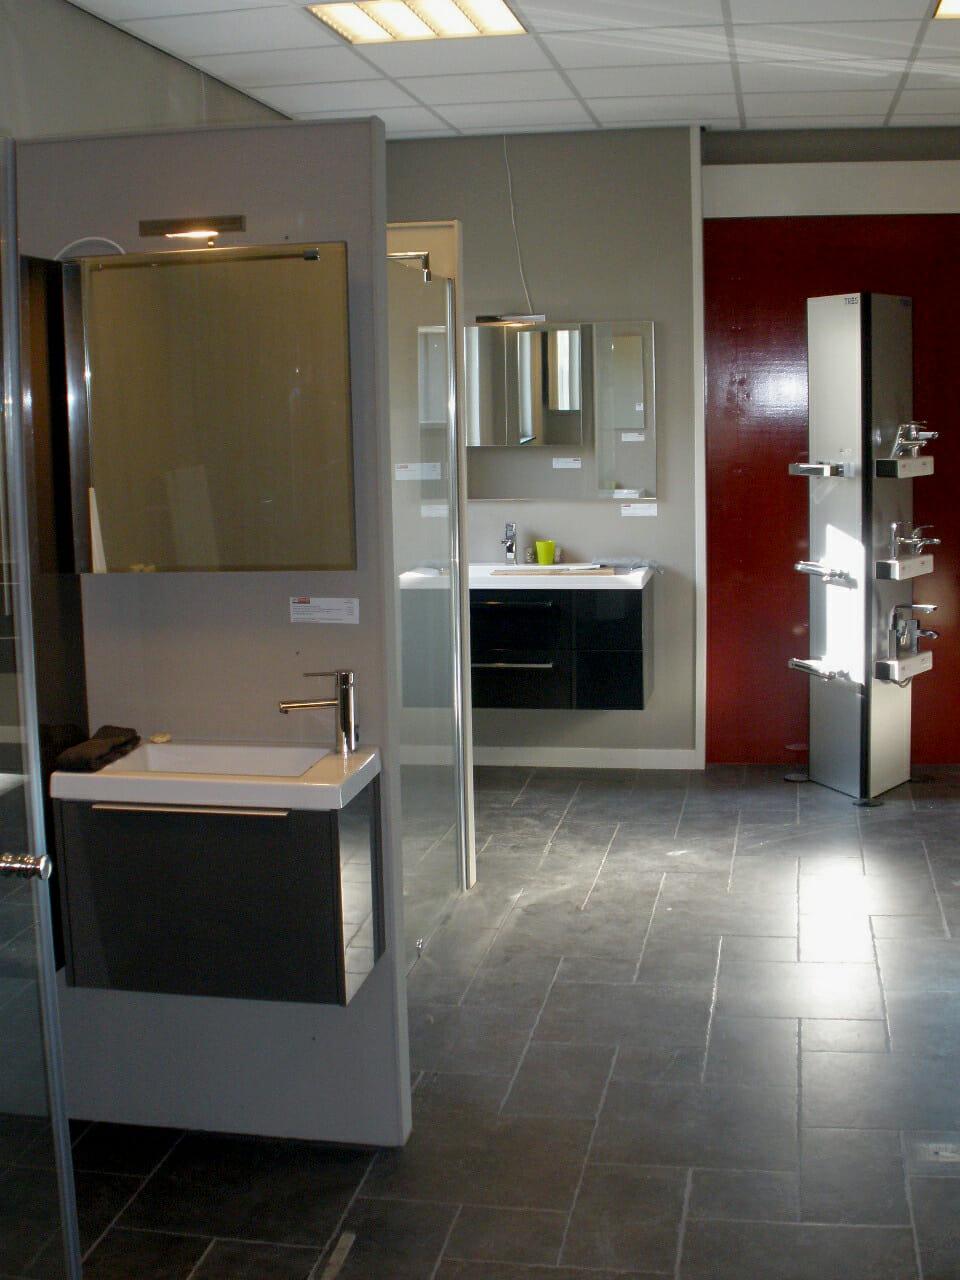 Badmeubel sanitair | Gerrit van de Wetering